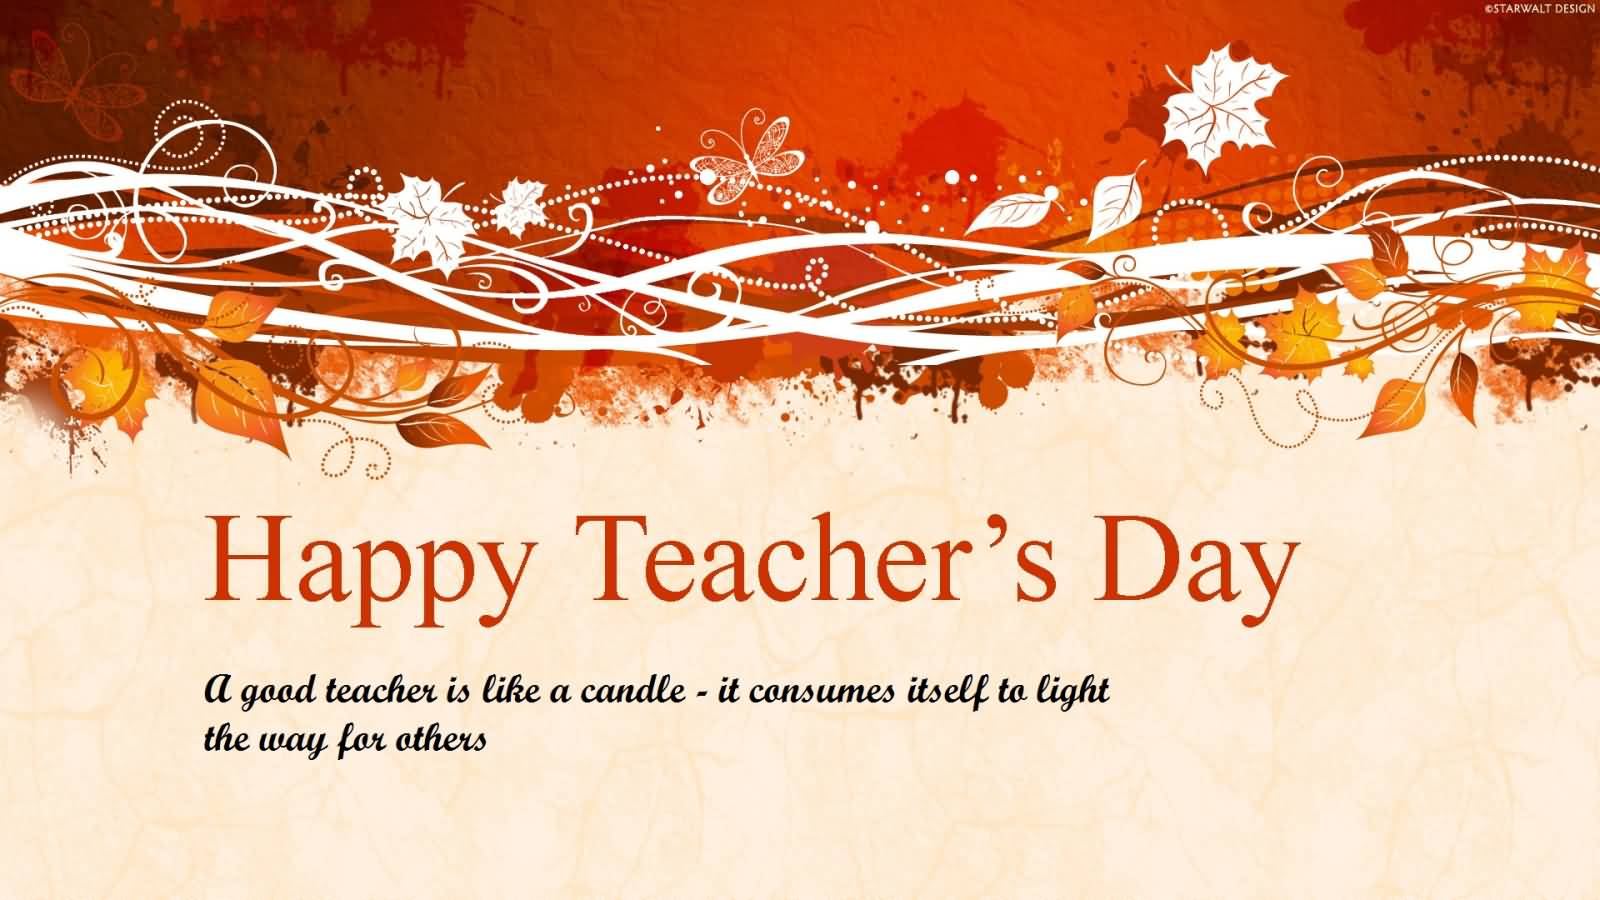 Happy Teachers Day Wallpaper For Mobile